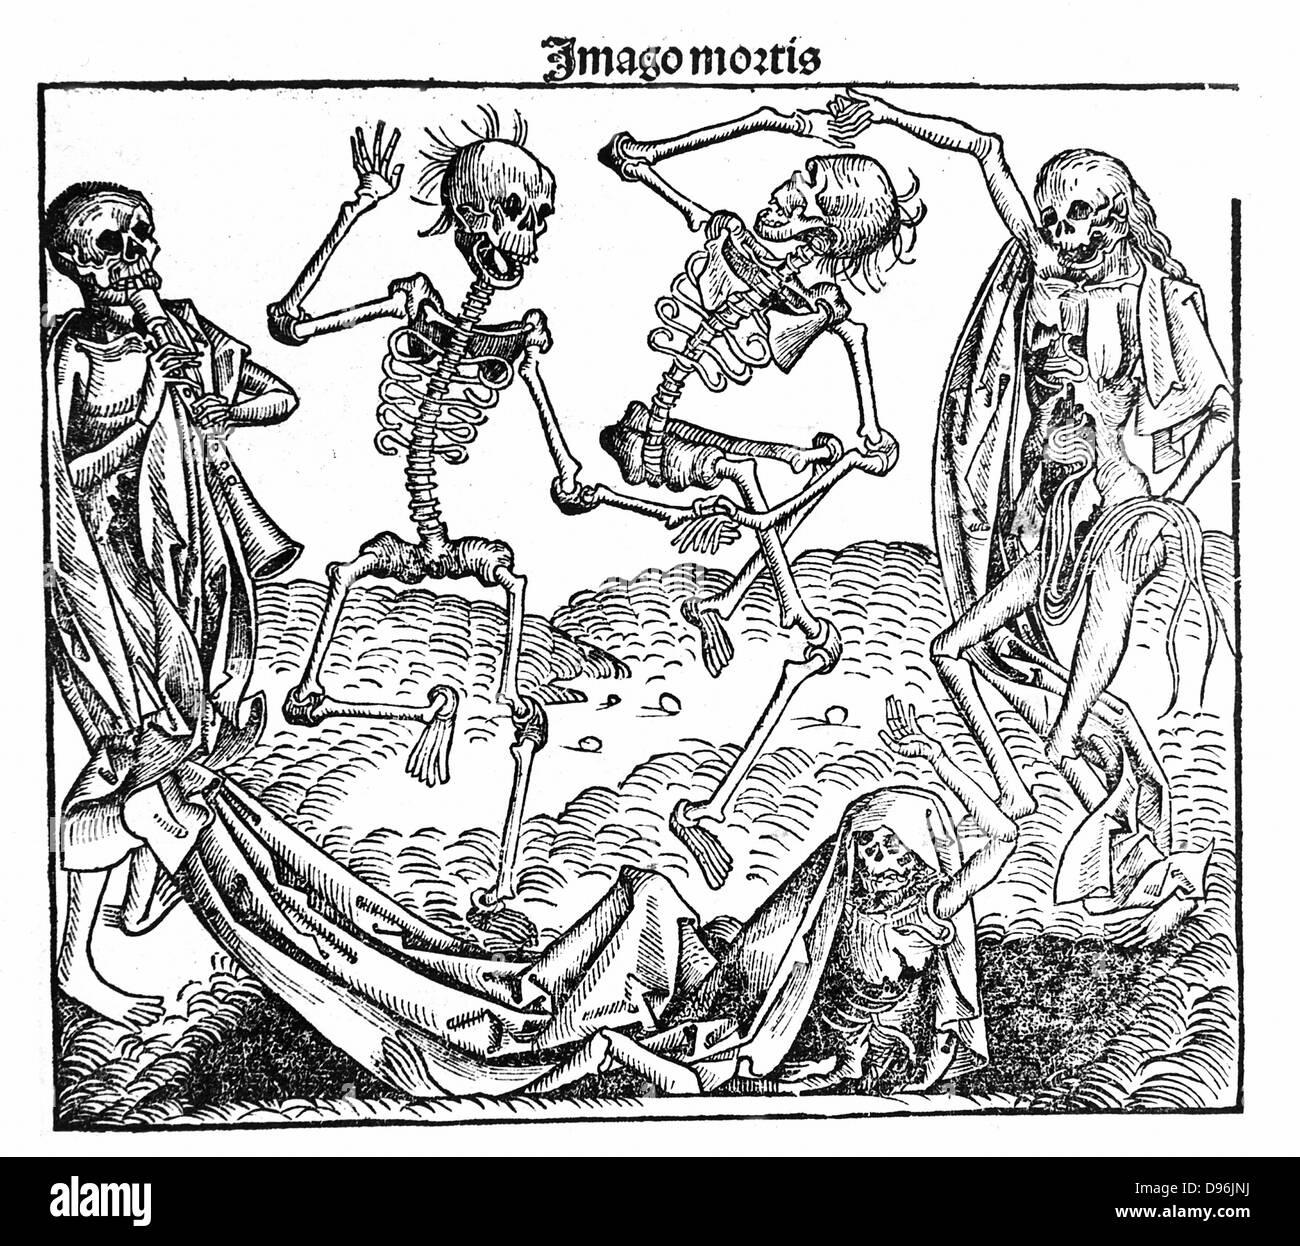 Death triumphant. From Hartmann Schedel 'Liber chronicarum mundi' (Nuremberg Chronicle), 1493. Skeletons - Stock Image